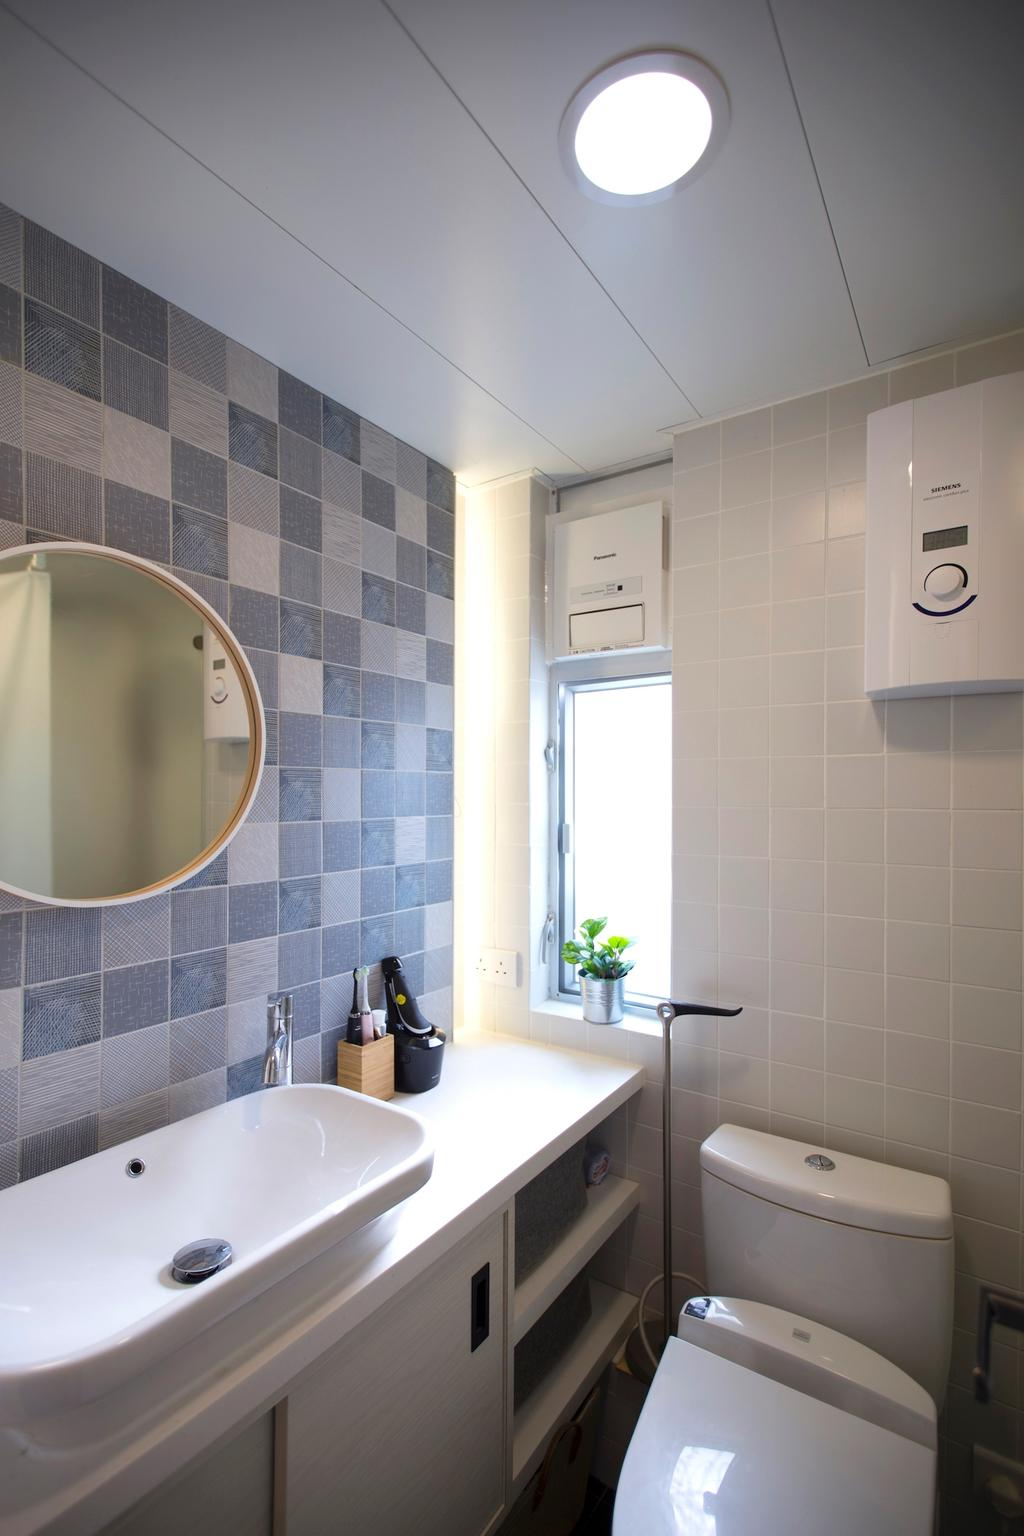 過渡時期, 私家樓, 浴室, 珍珠閣, 室內設計師, am PLUS, 傳統, Indoors, Interior Design, Room